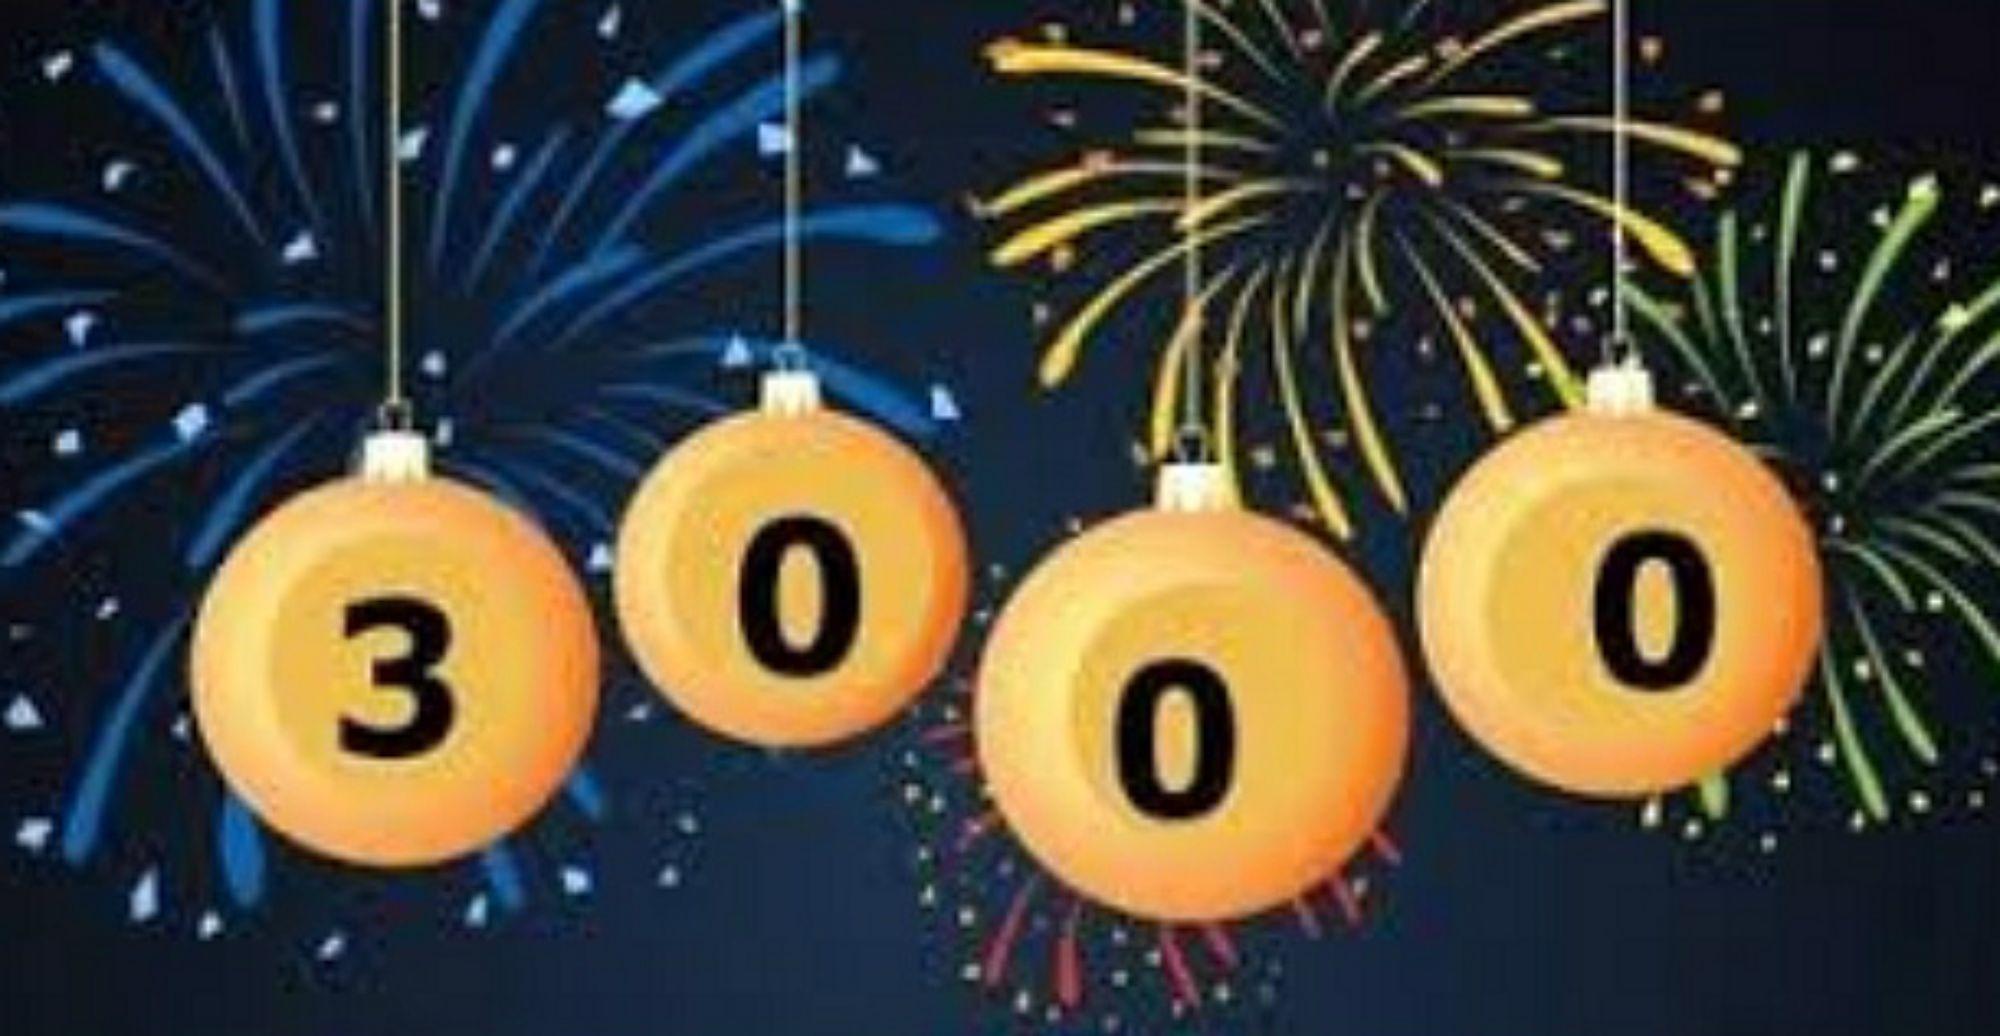 A railway community of 3000 members!